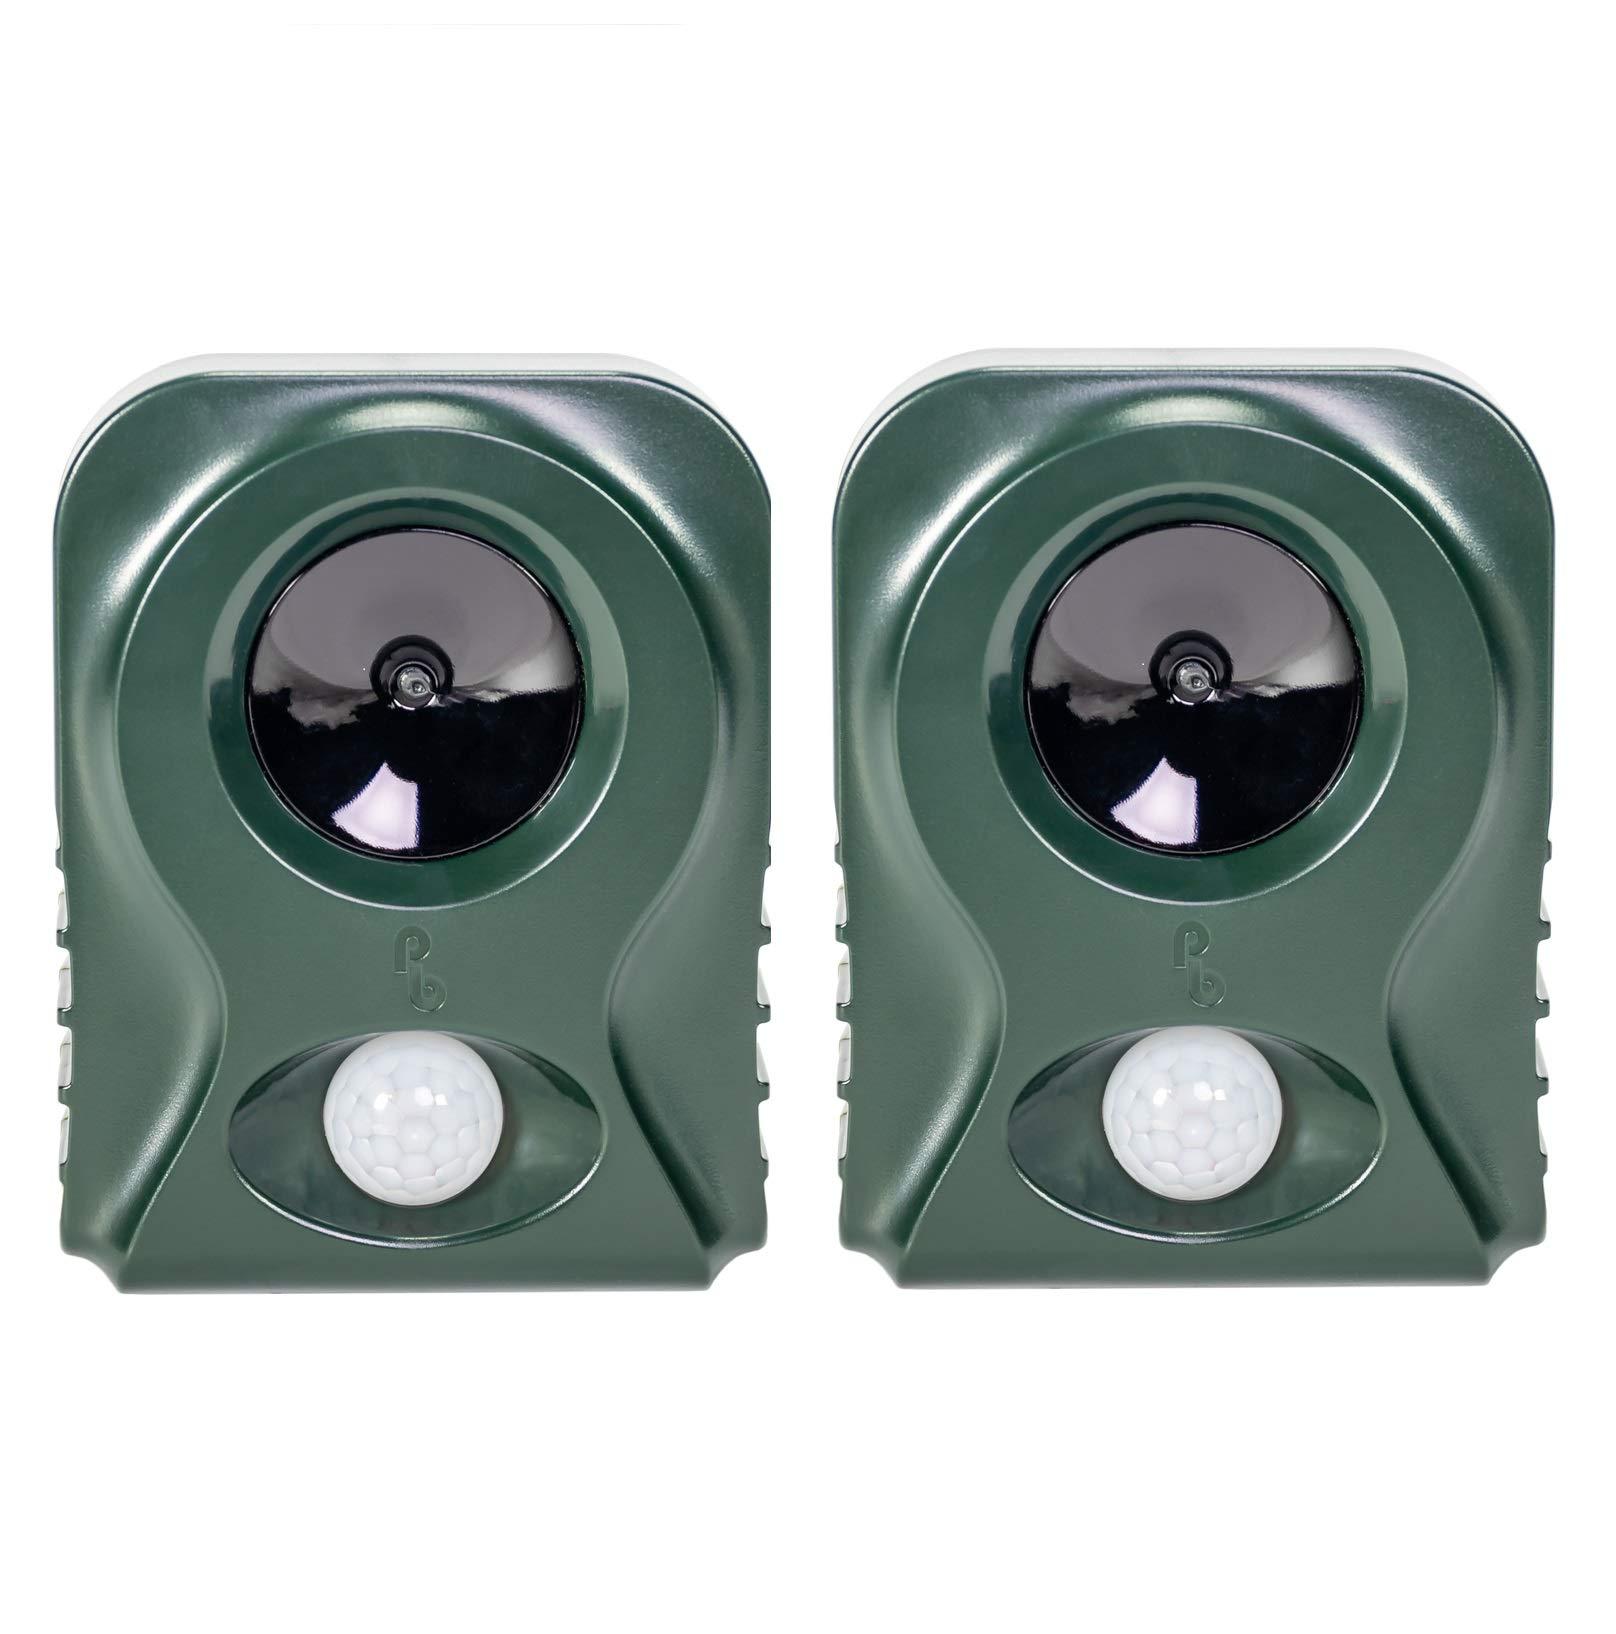 Pestbye Pack de 2 Repelentes de Gatos Sistema HyperResonance Frequency (Pilas), Green: Amazon.es: Jardín